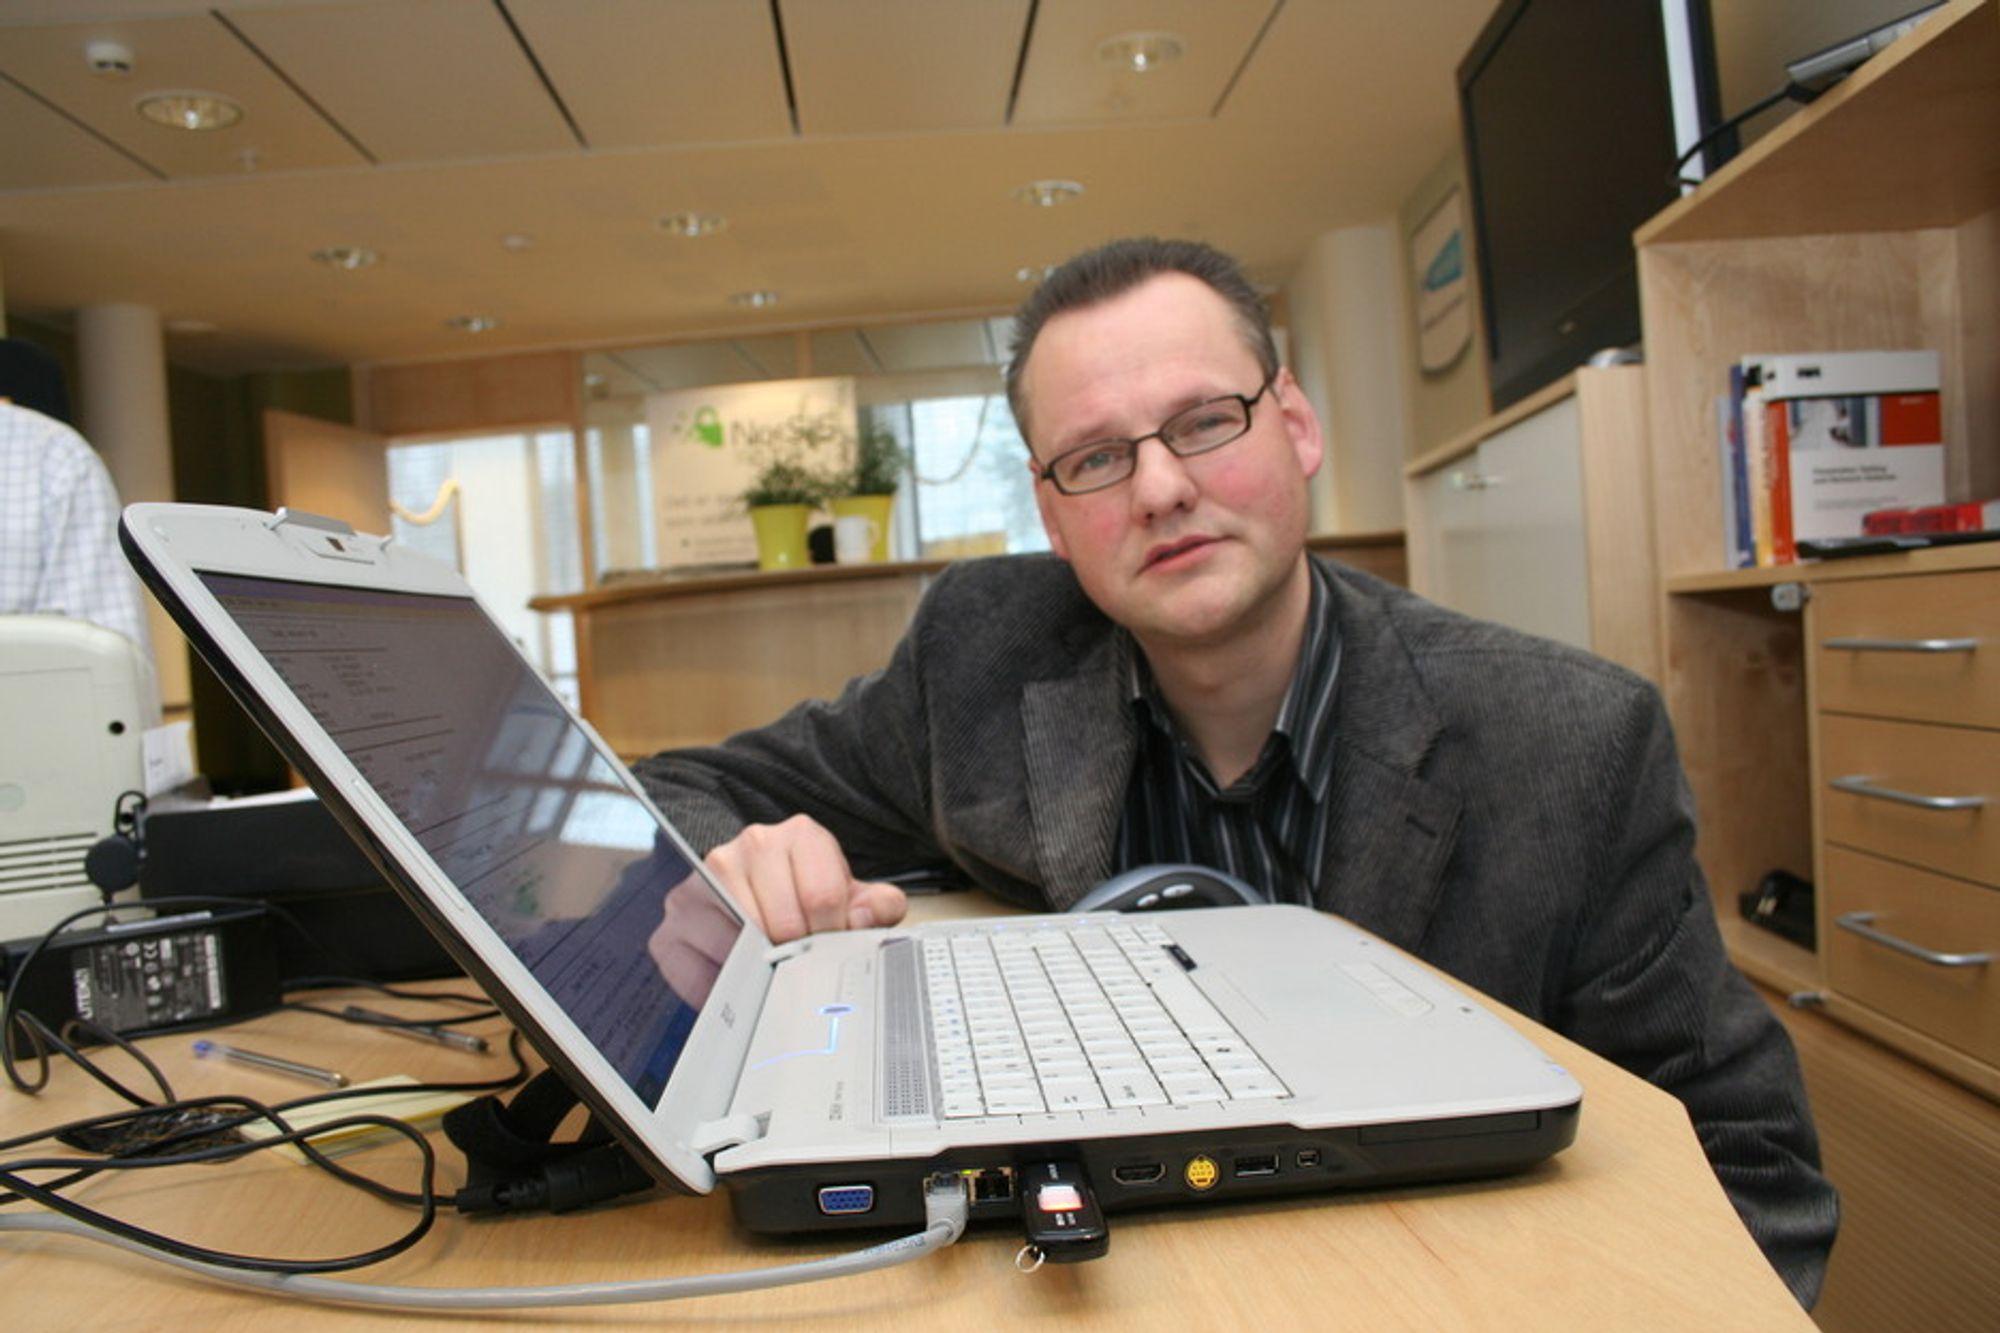 ÅPEN. Firewireporten på en PC er åpen for angrep, advarer Norsis, her ved seniorrådgiver Vidar Sandland.